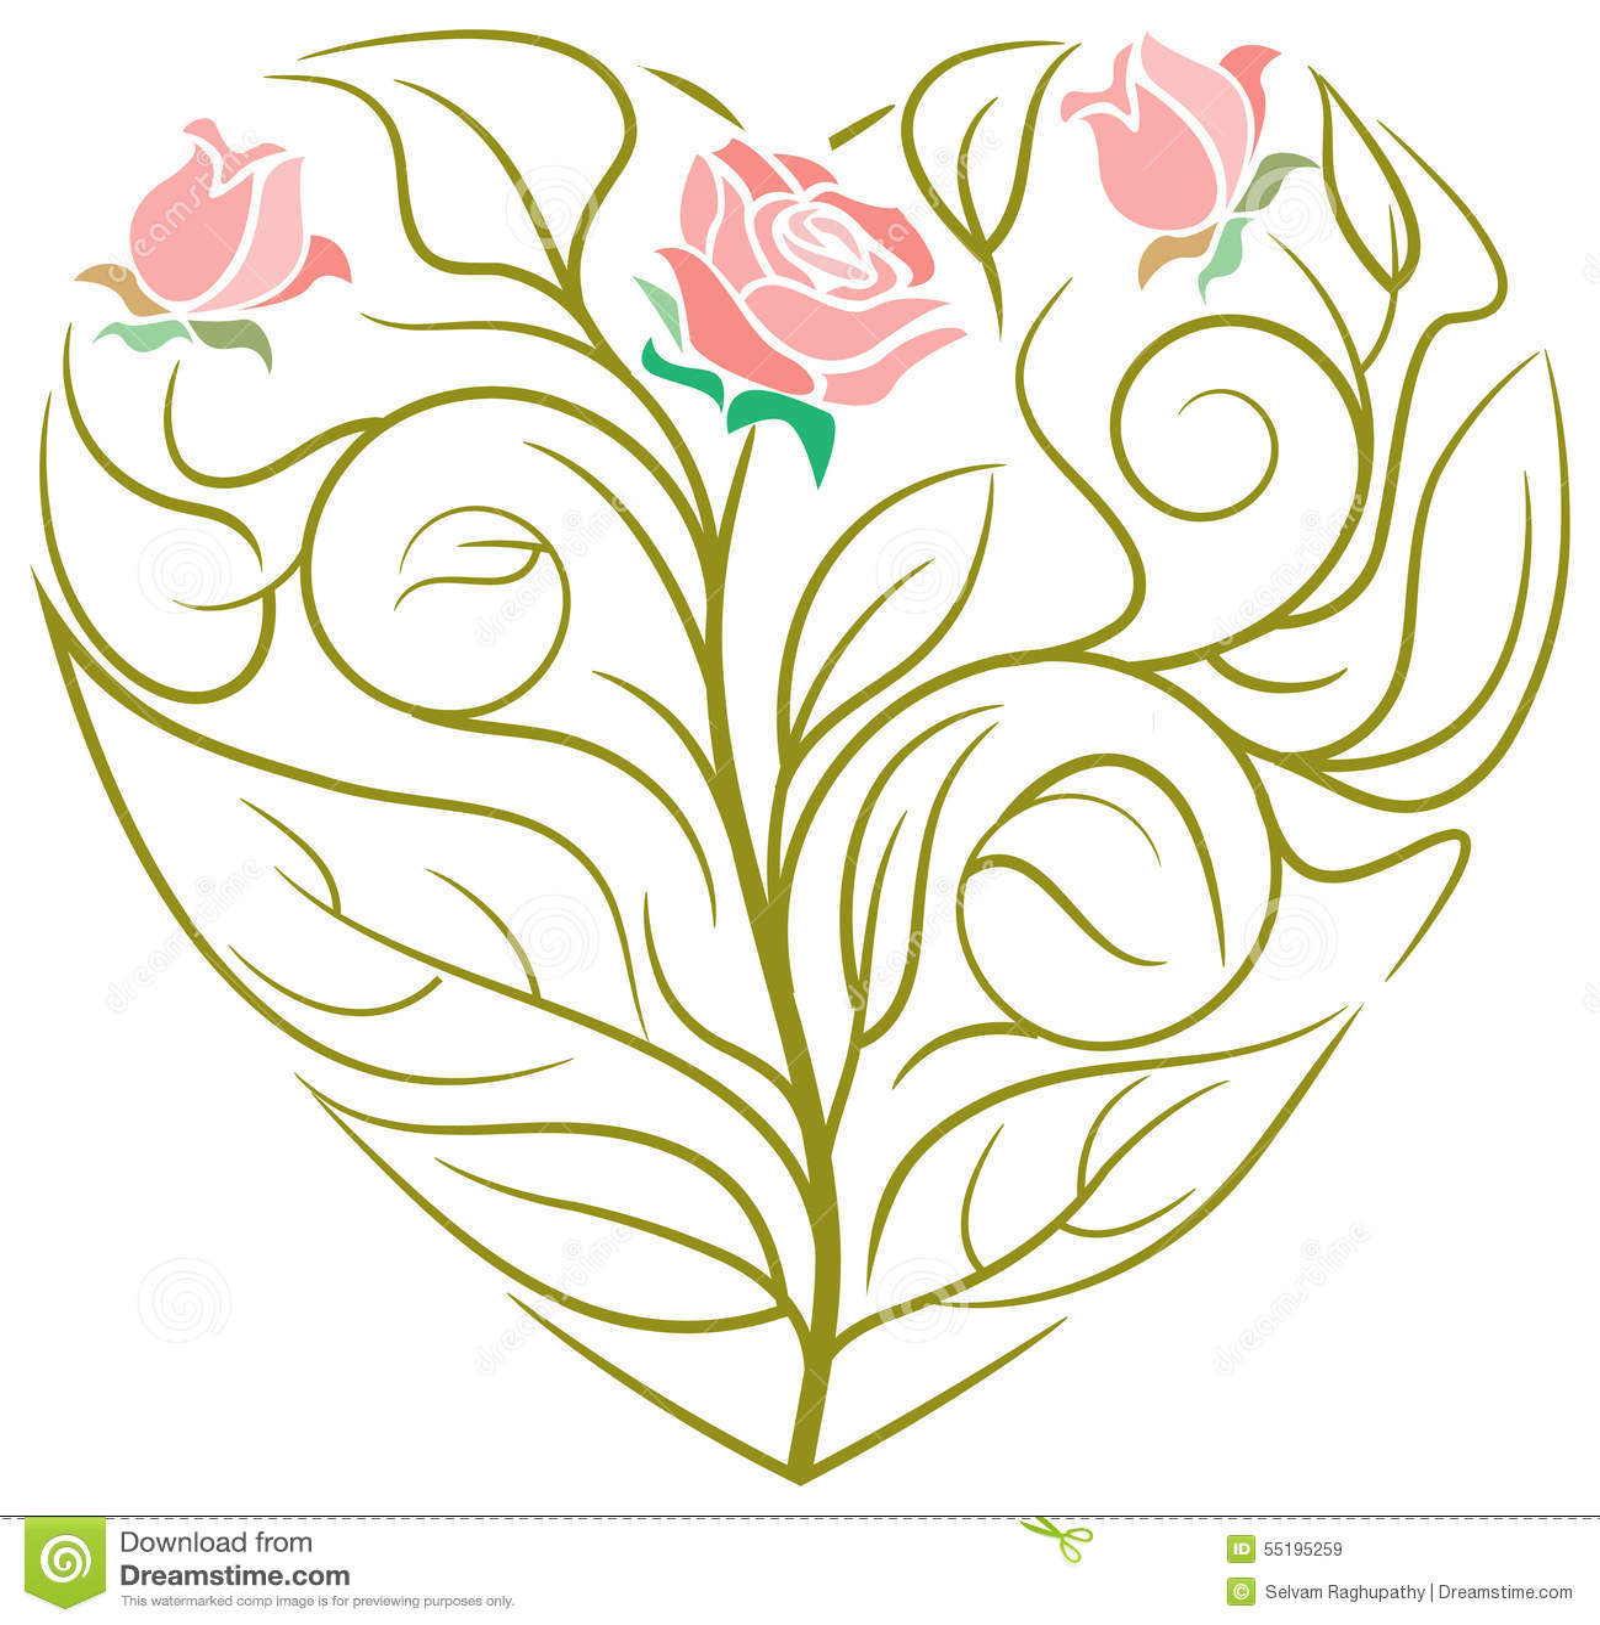 Heart Line Art Design : Heart design stock vector illustration of frame bouquet